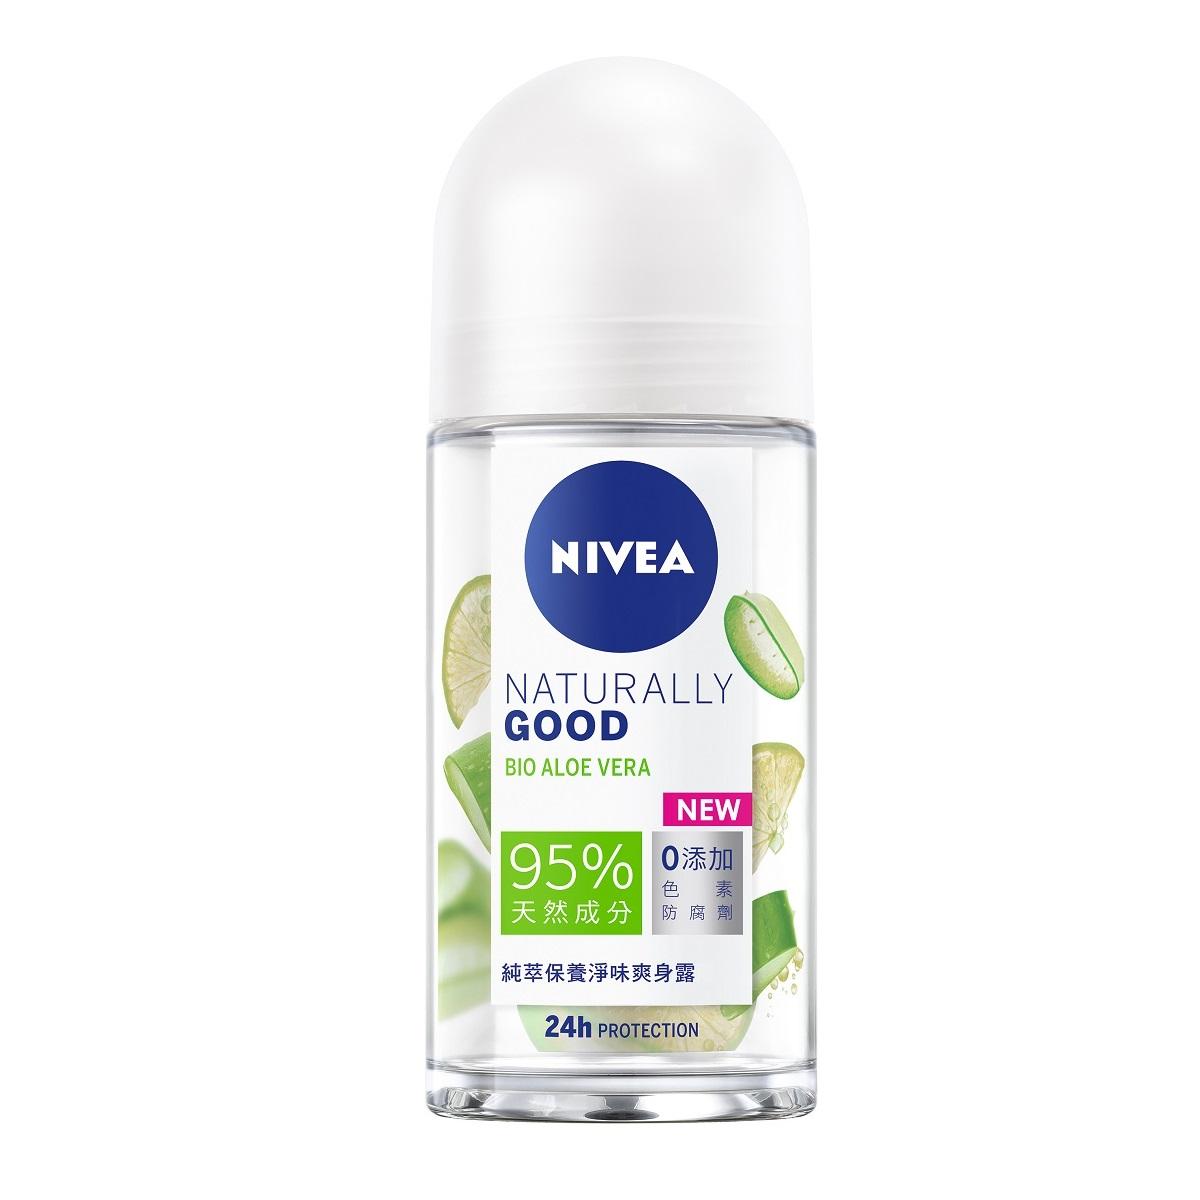 NIVEA妮維雅純萃保養淨味爽身露天然有機蘆薈50ml